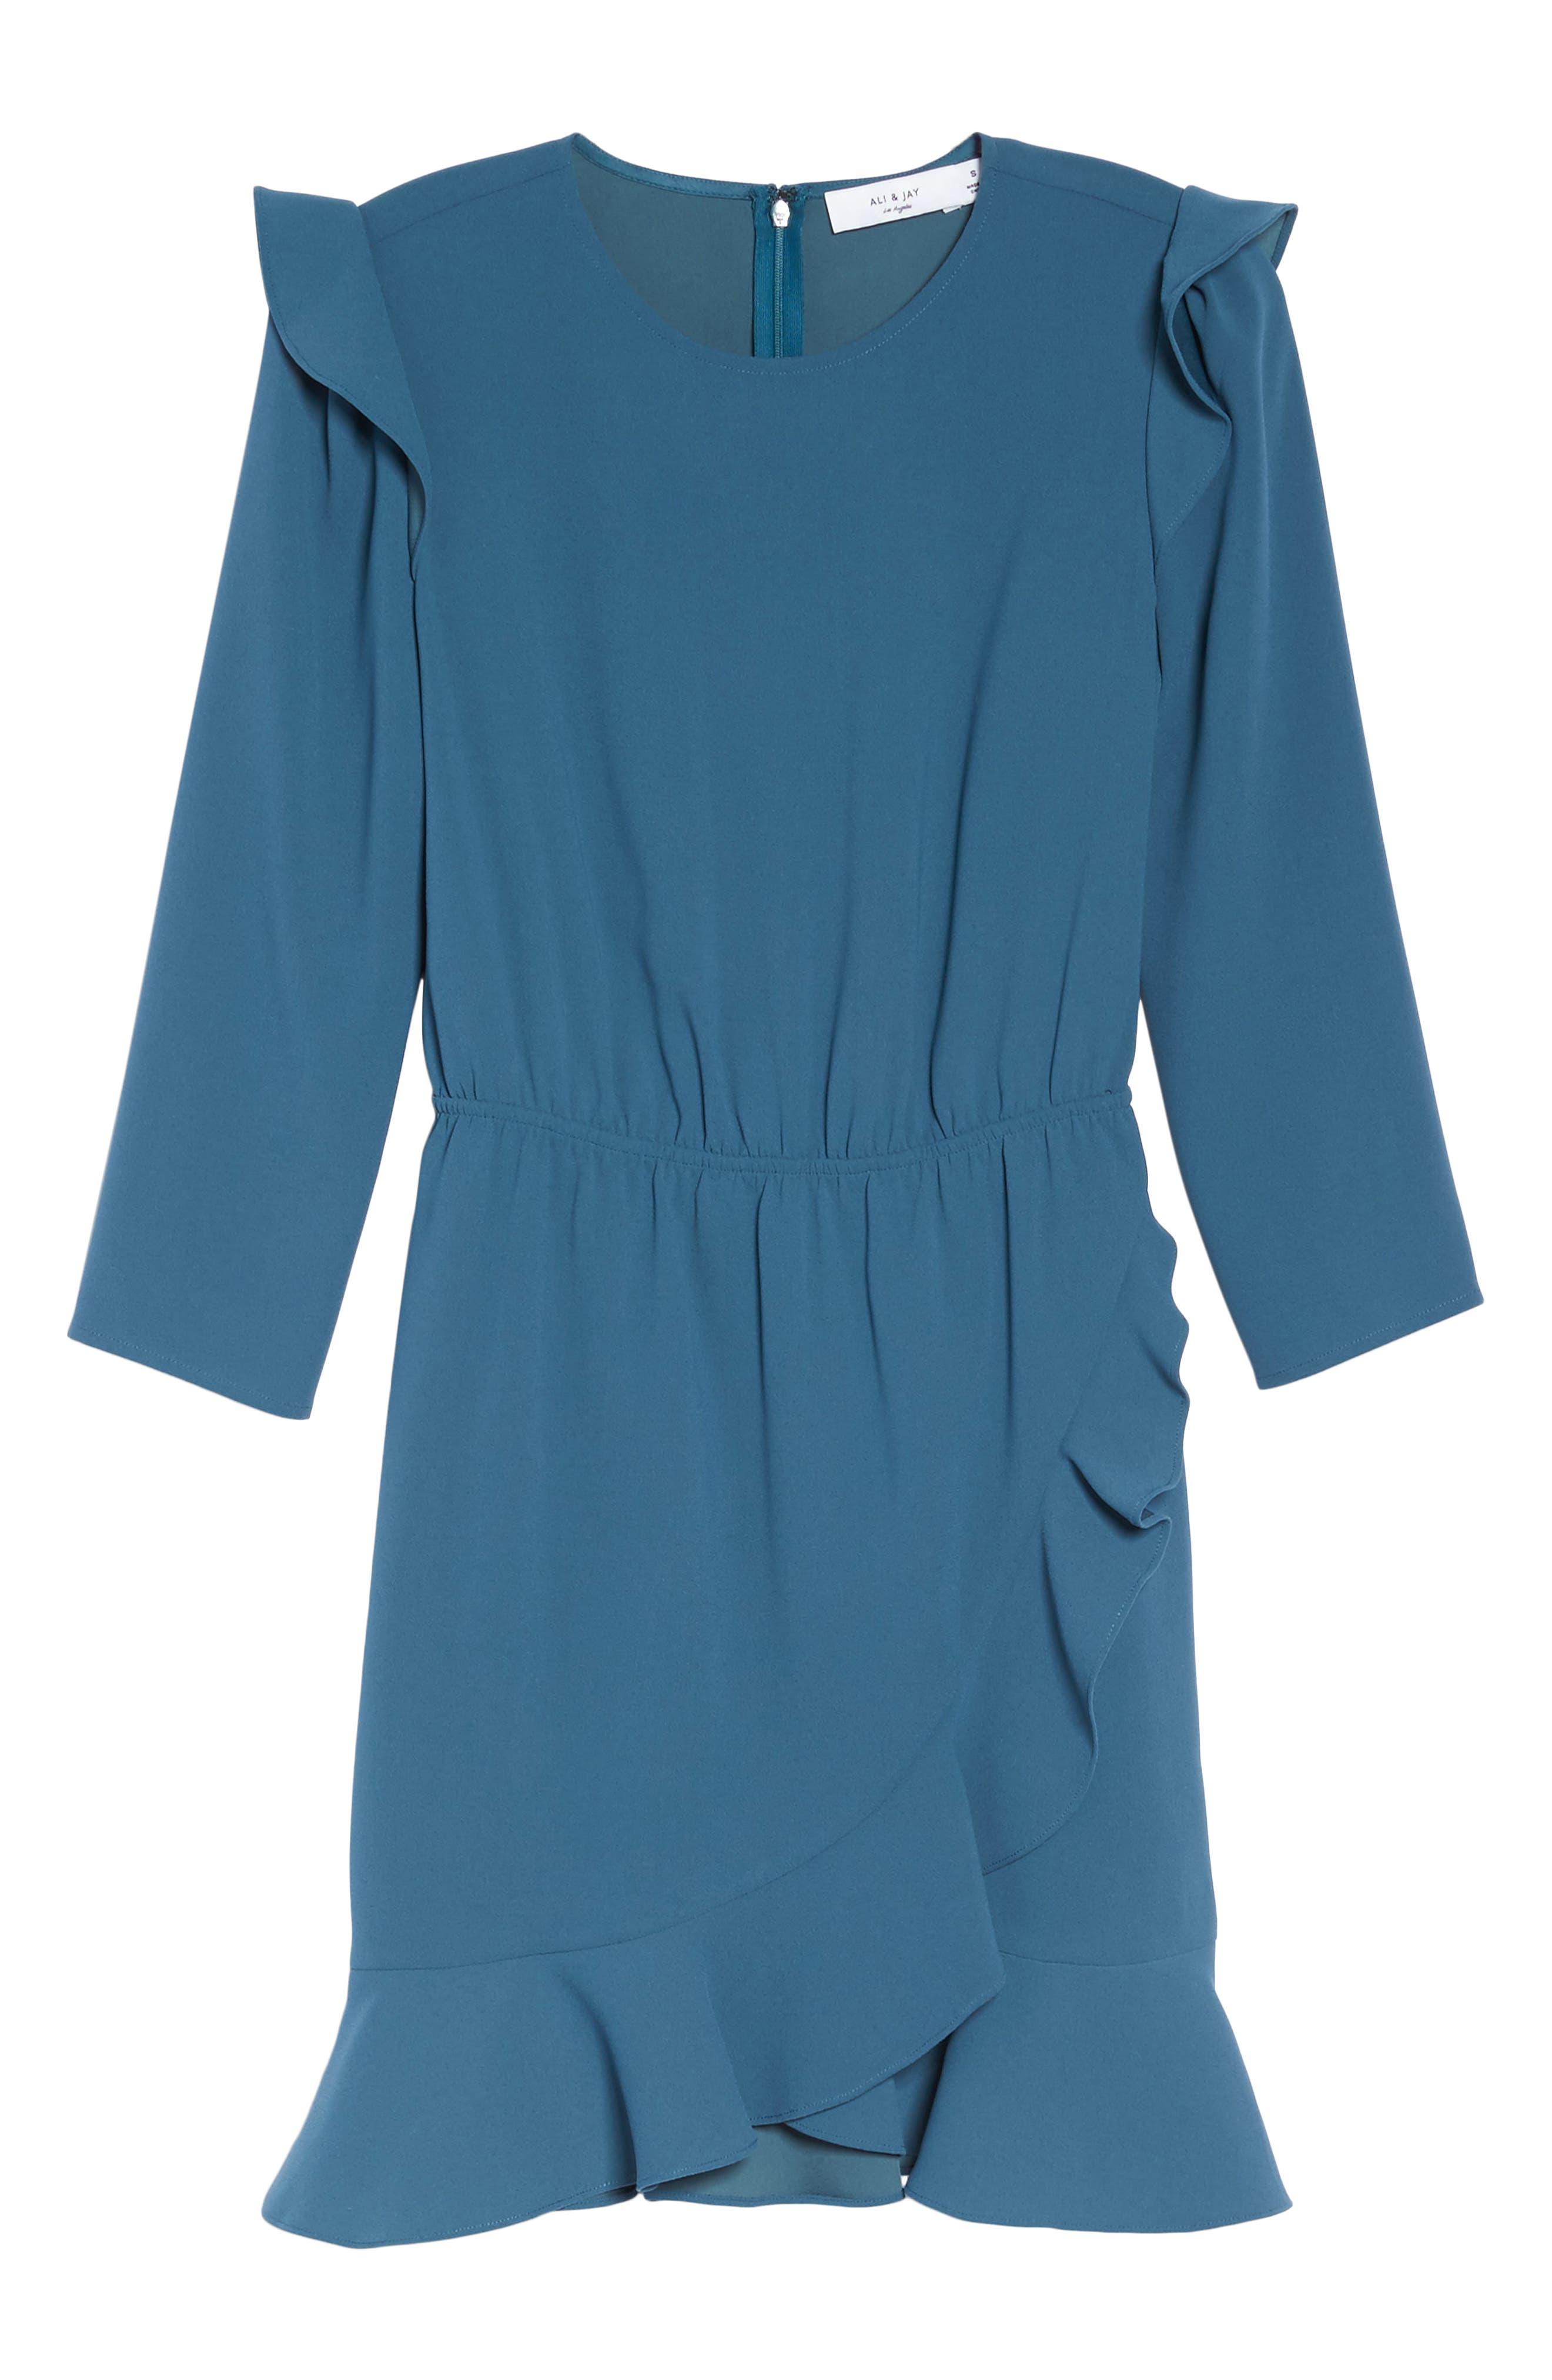 St Germain Ruffle Fit & Flare Dress,                             Alternate thumbnail 12, color,